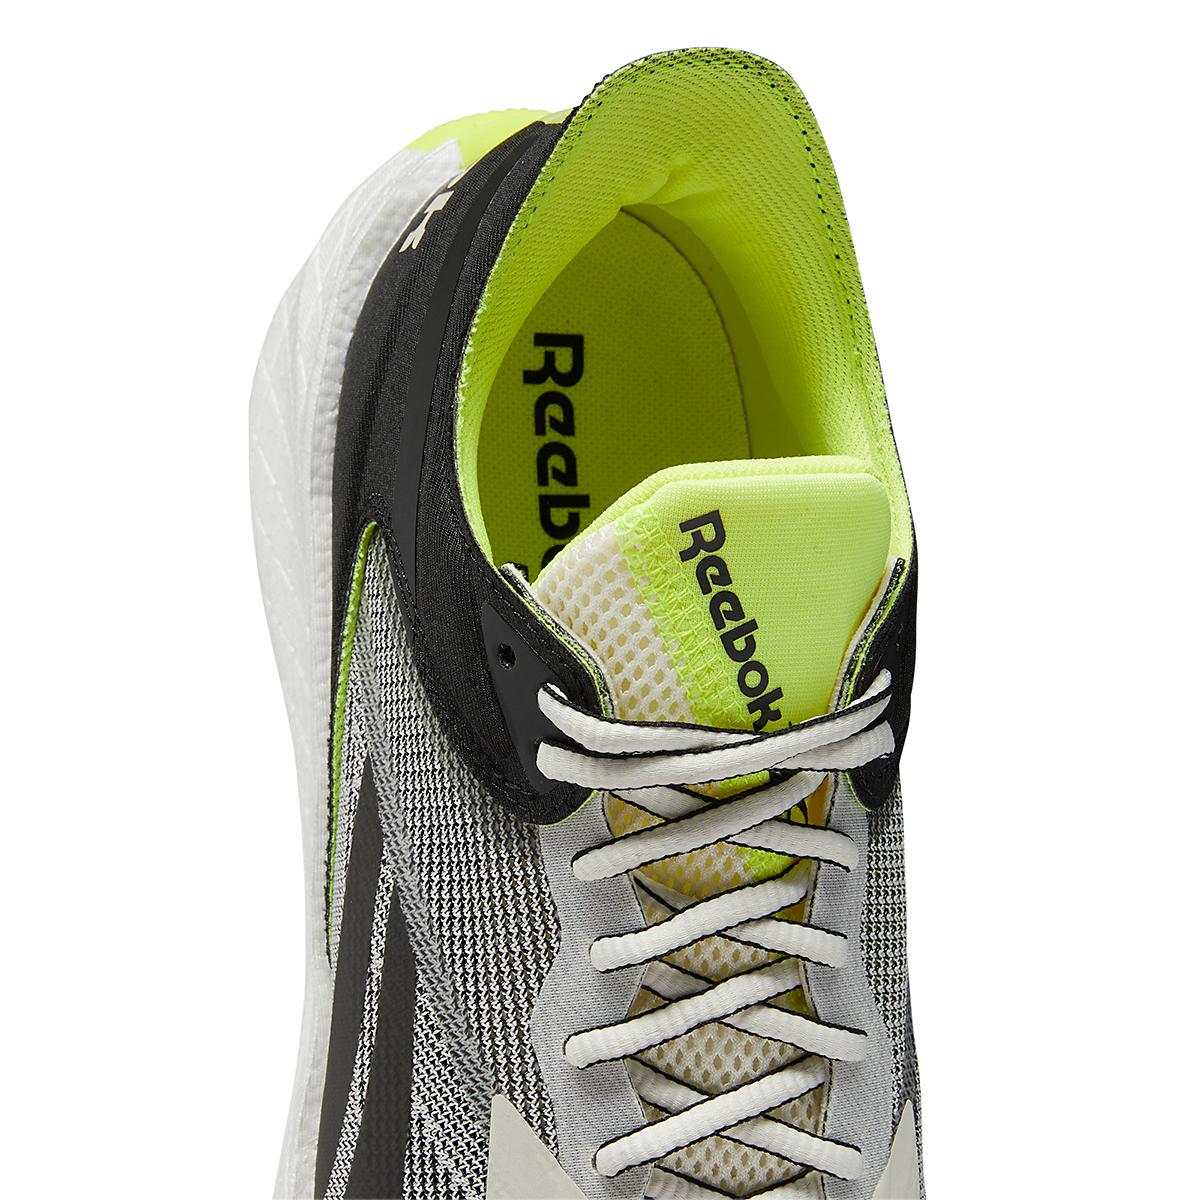 Men's Reebok Floatride Energy Symmetros Running Shoe - Color: Classic White/Core Black/Yellow Flare - Size: 7 - Width: Regular, Classic White/Core Black/Yellow Flare, large, image 4